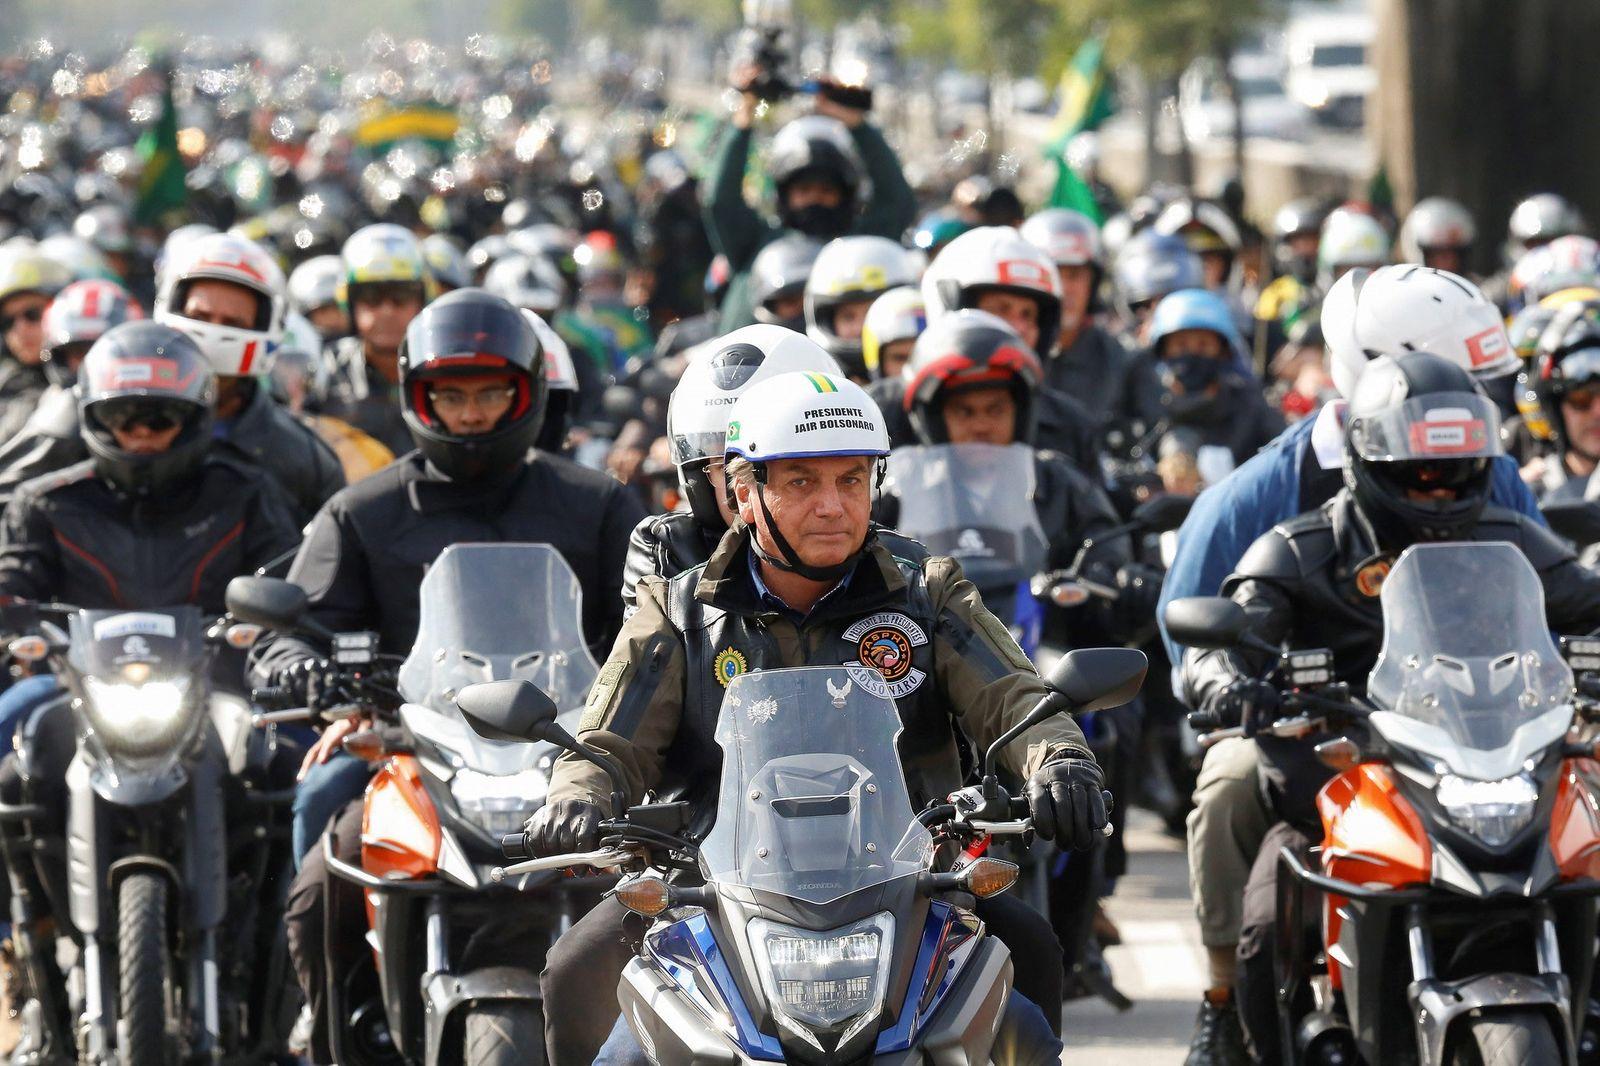 Bolsonaro once again defies the pandemic and leads massive motorcycle caravan